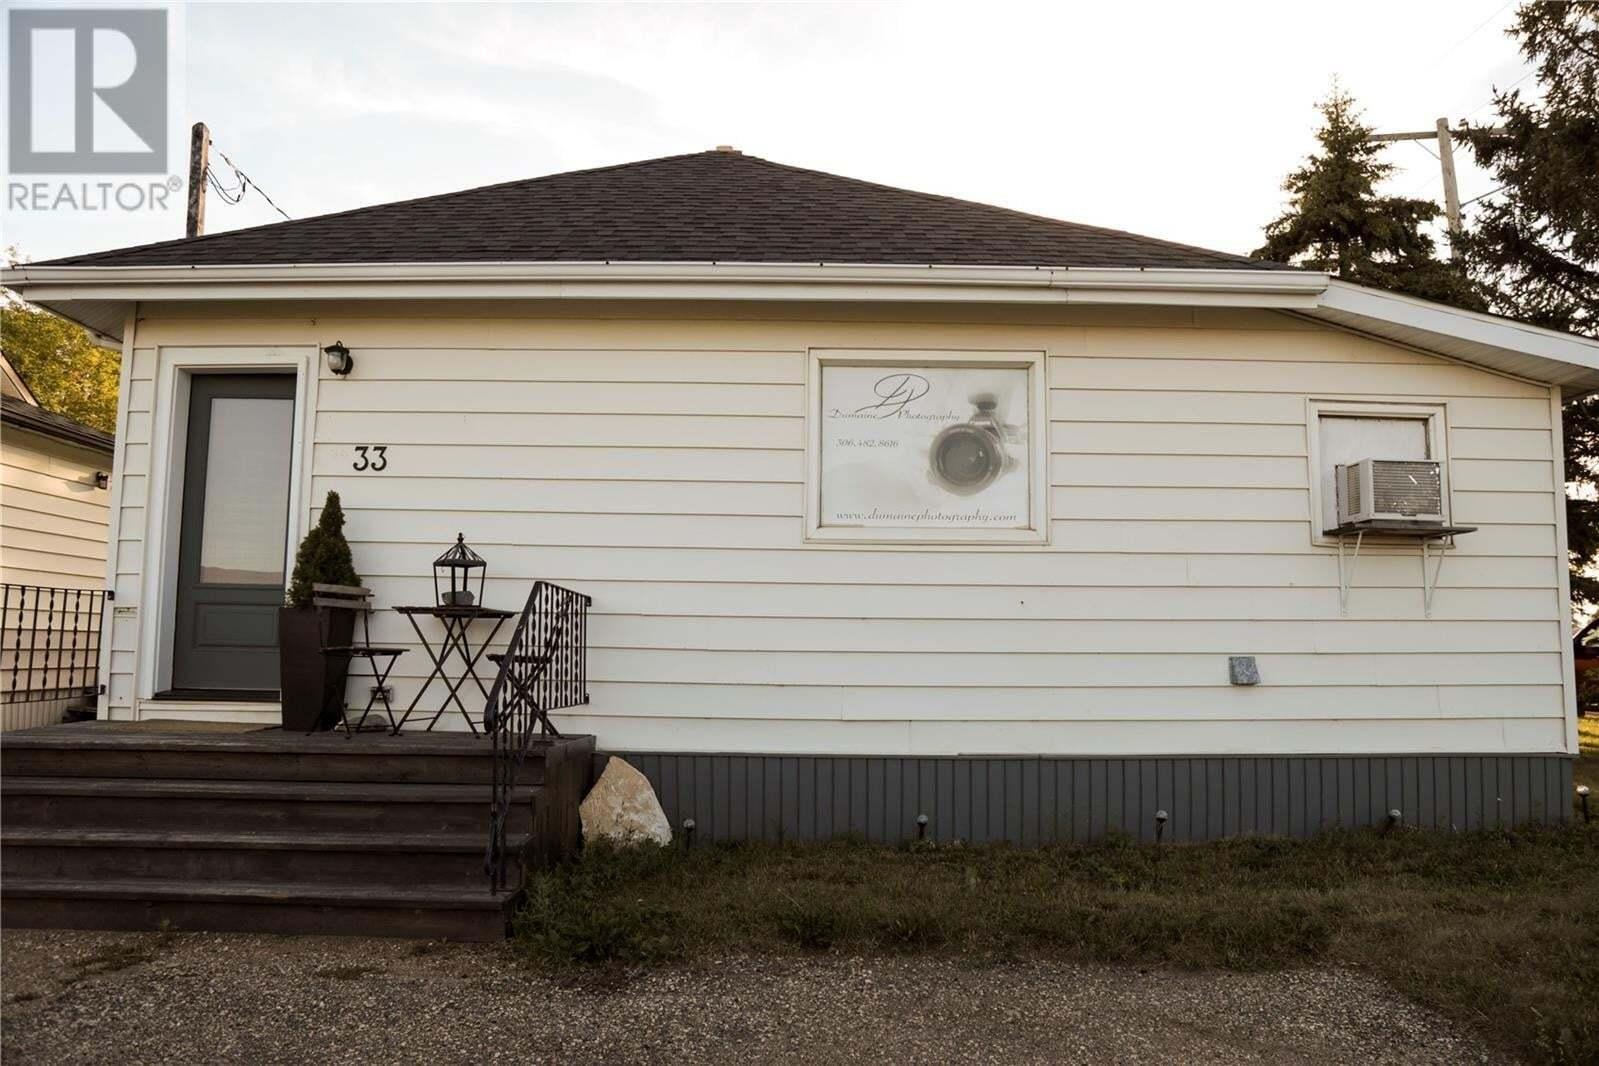 House for sale at 33 Eichhorst St Redvers Saskatchewan - MLS: SK819001